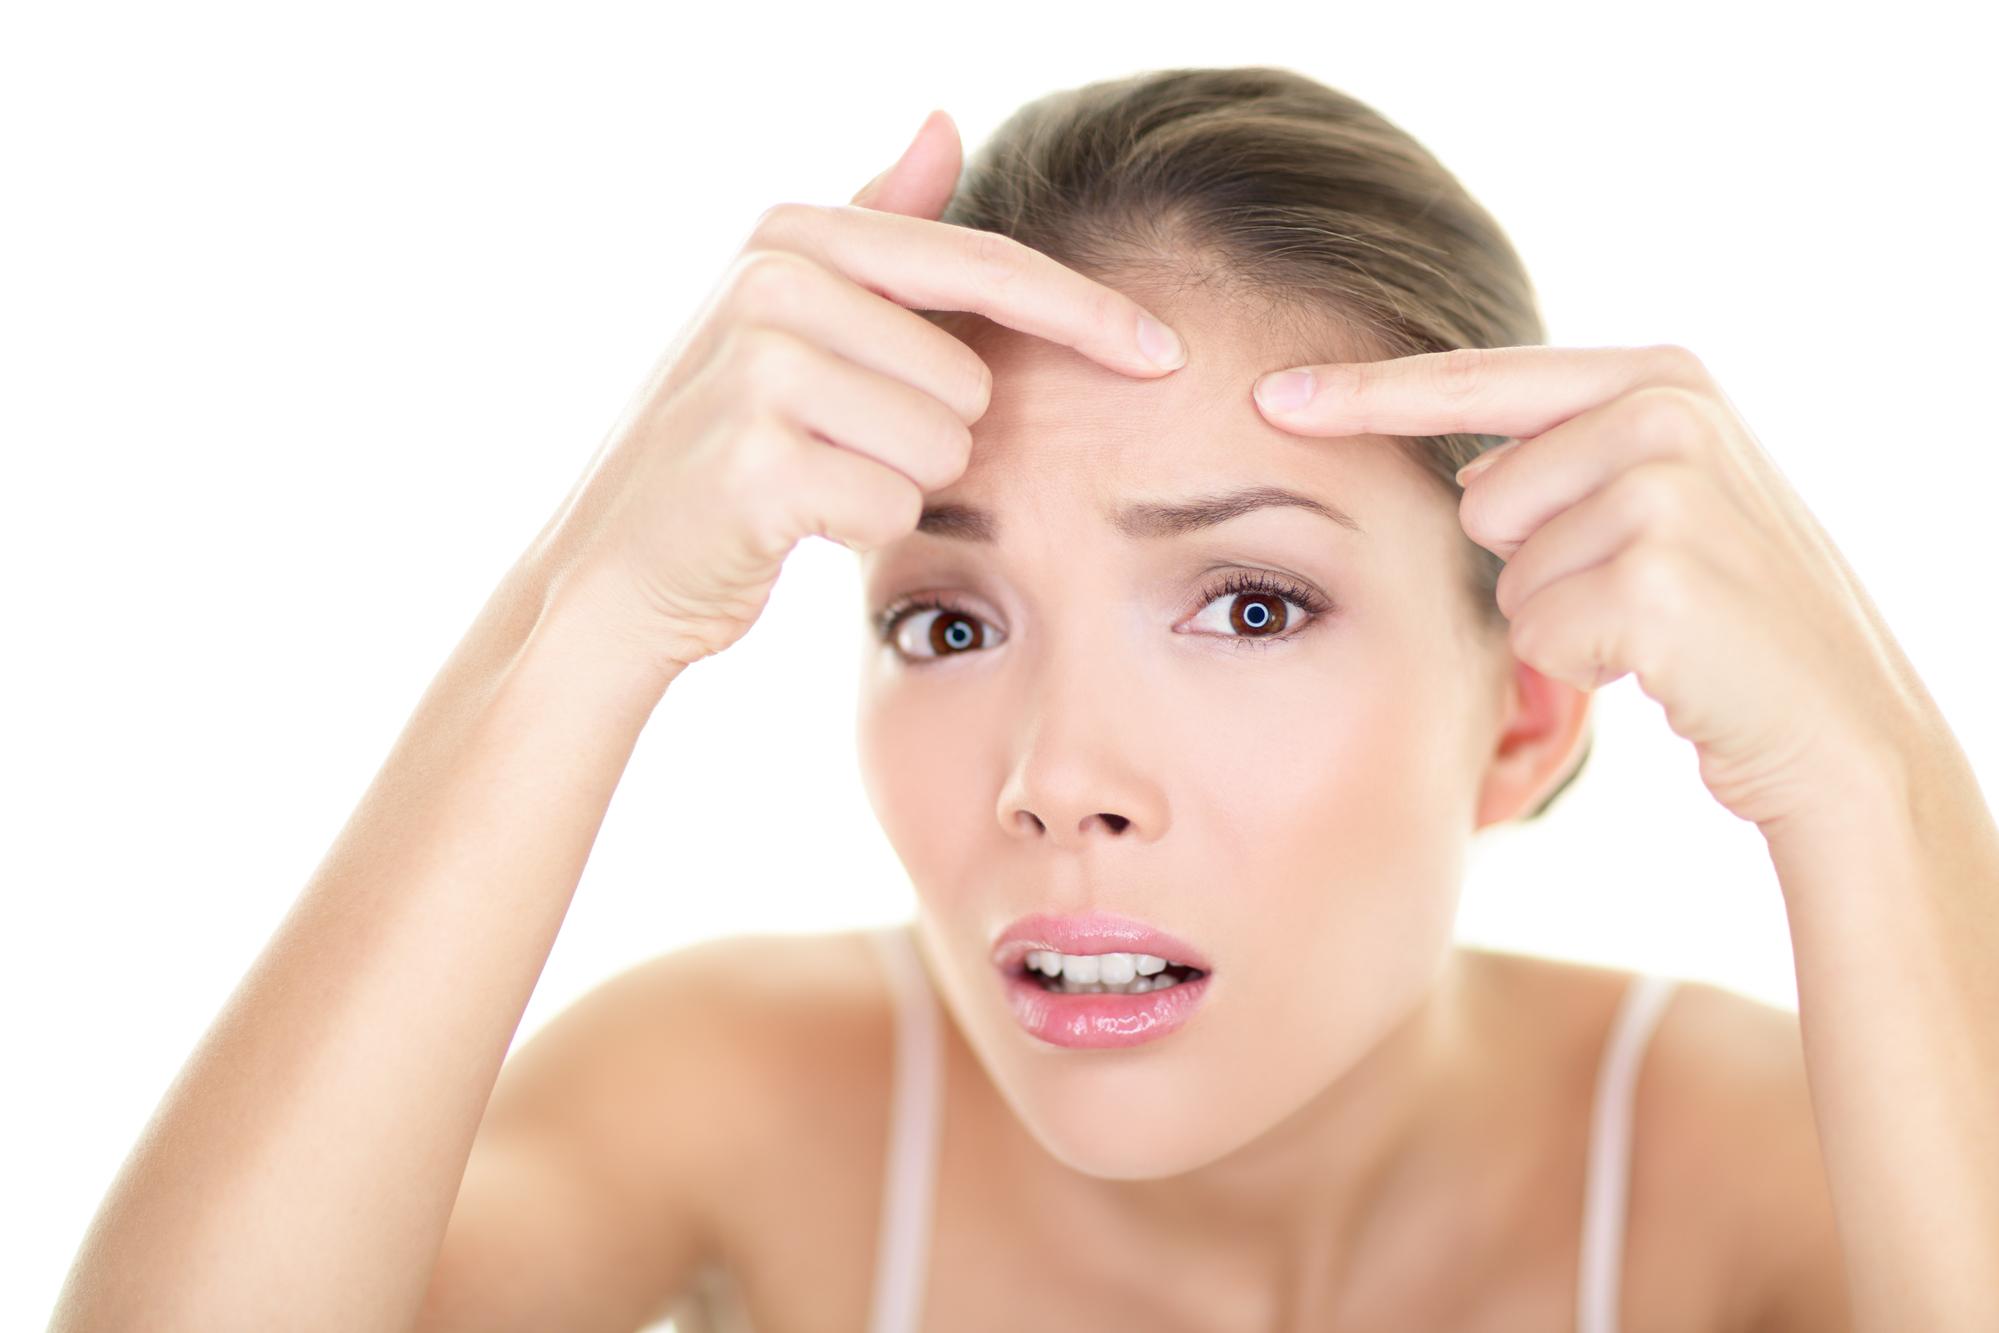 Acne Spot Pimple Skin Care Girl And Skin Problem